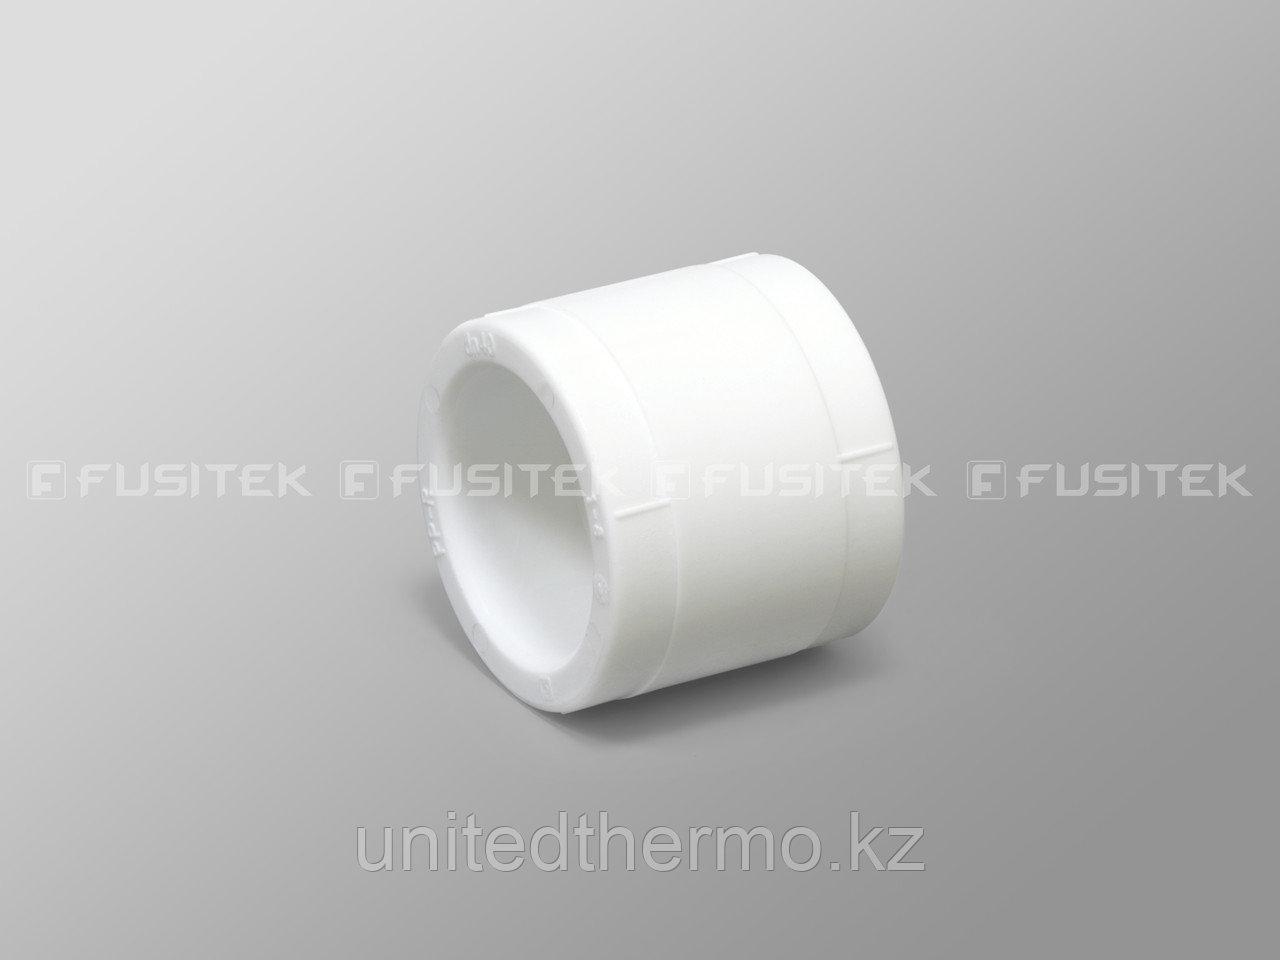 Муфта равносторонняя 90 мм Fusitek